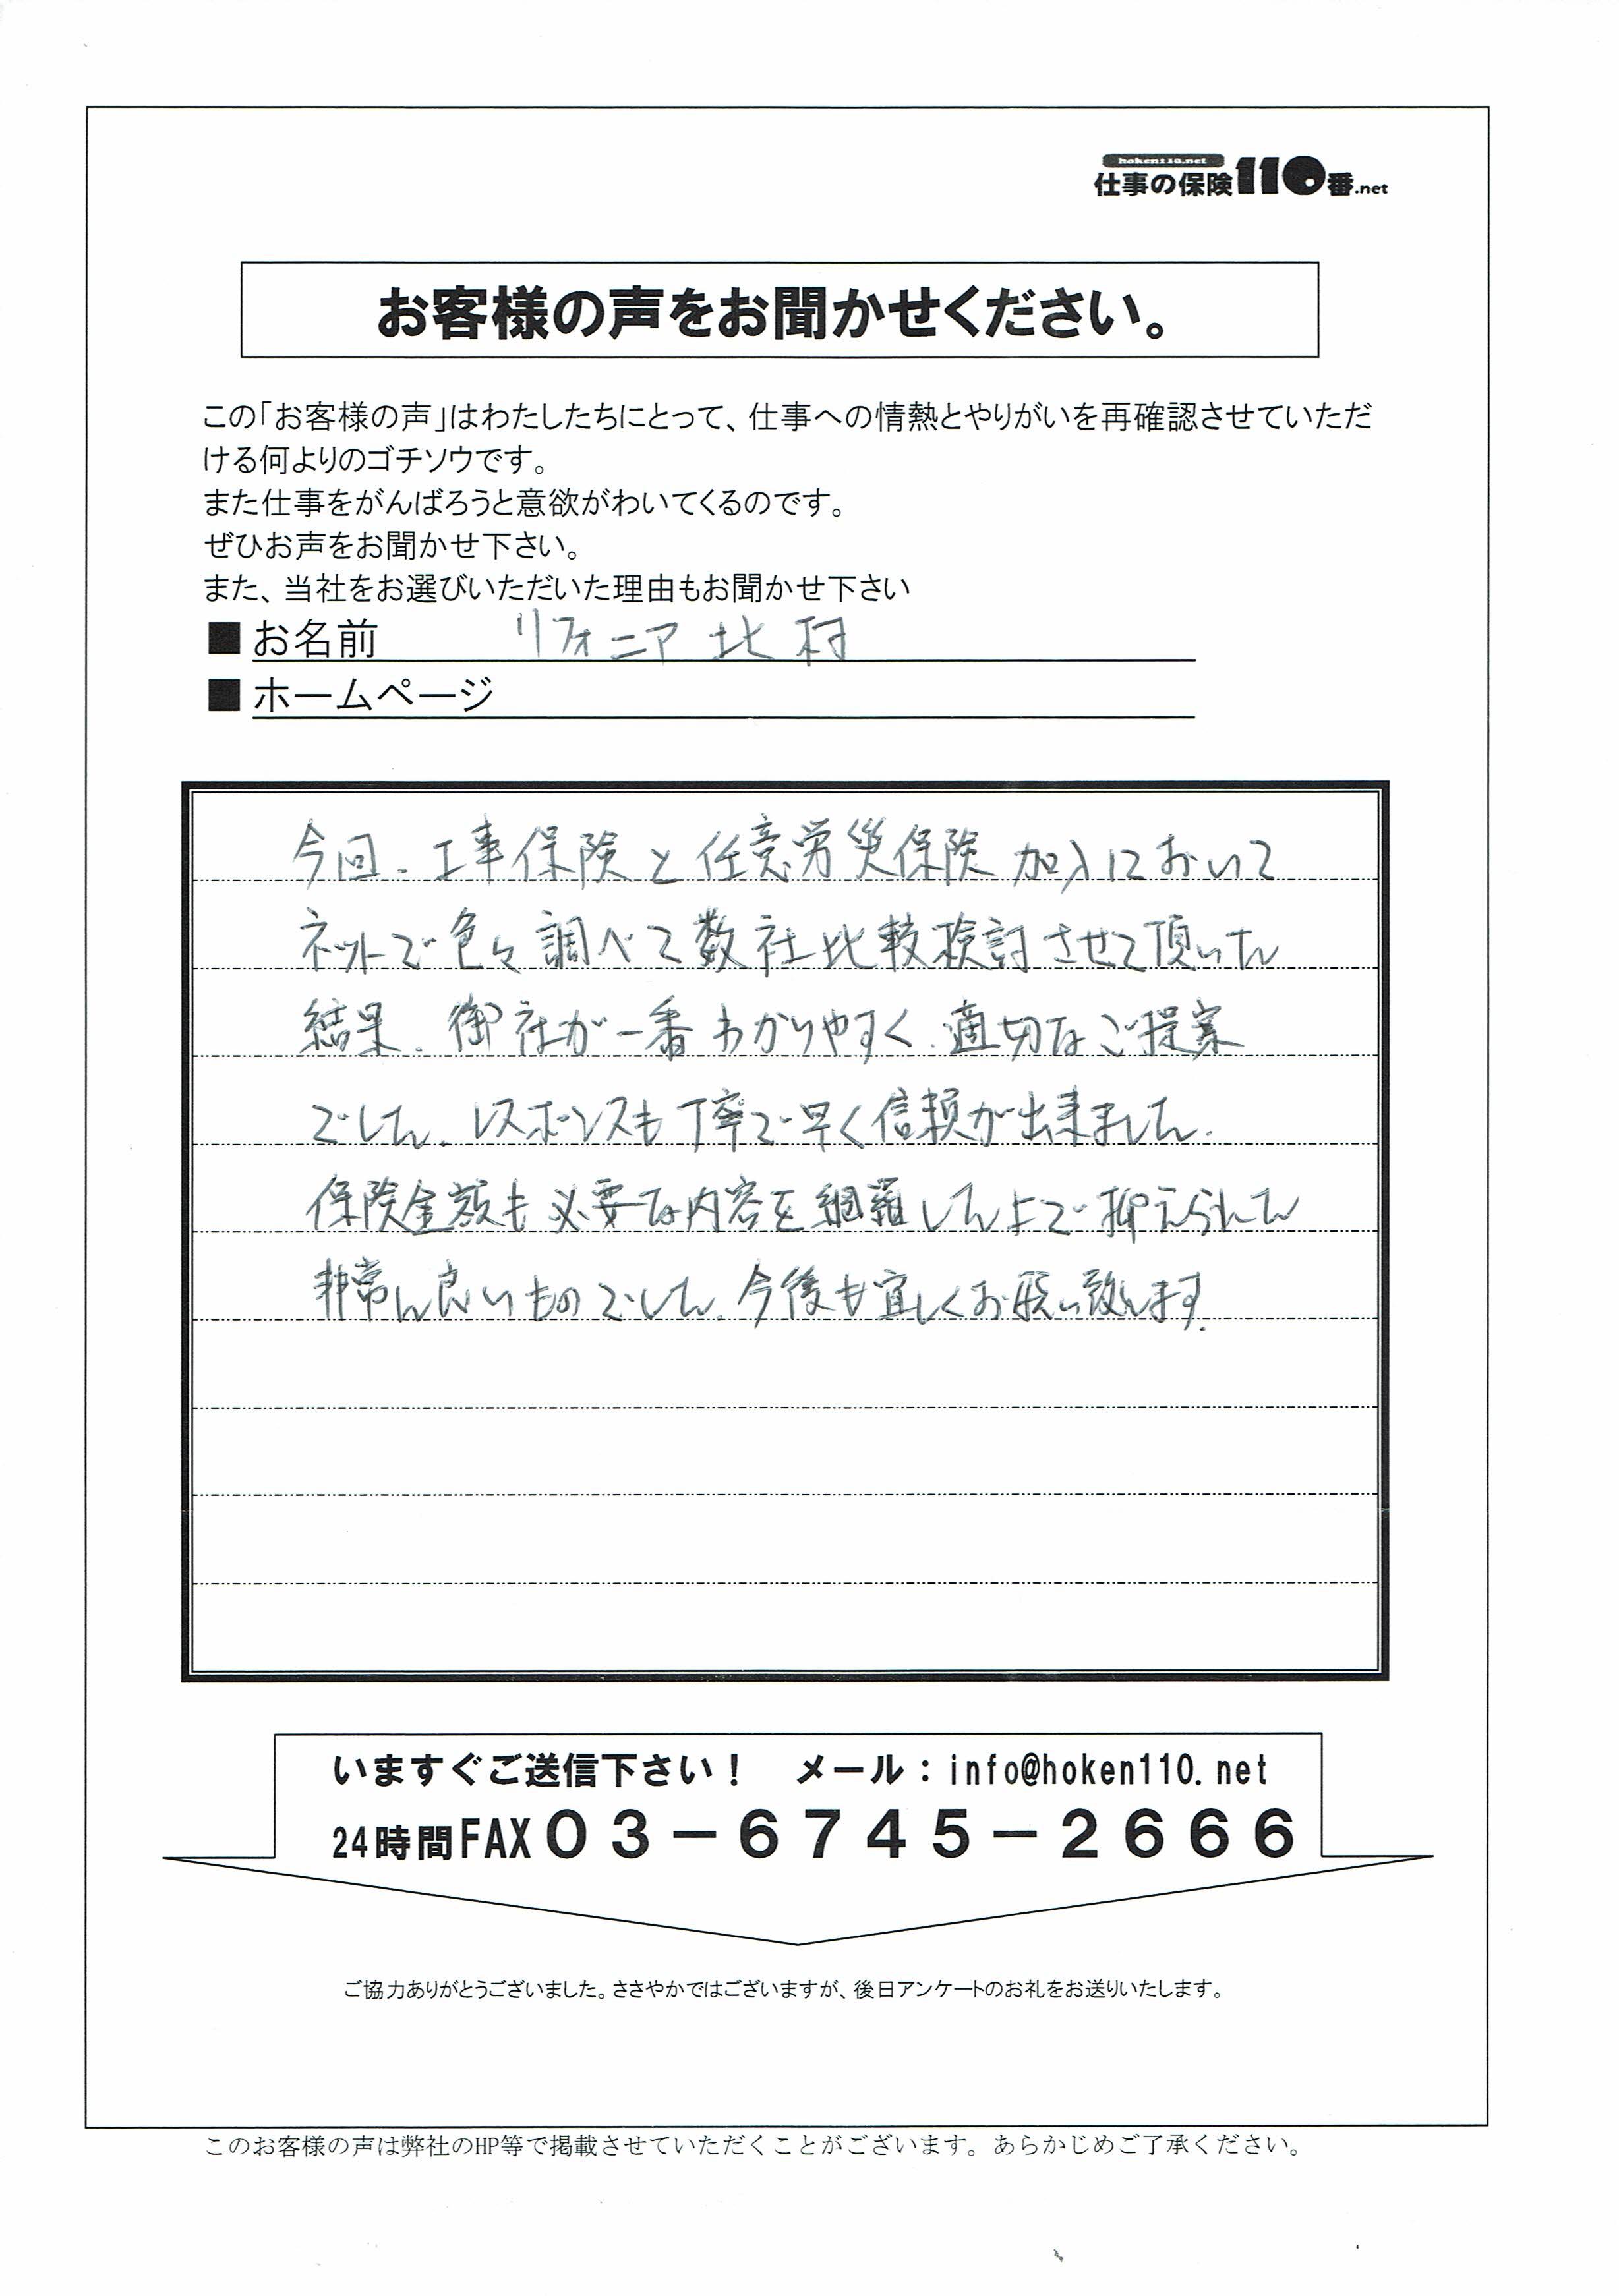 https://syotoku.biz/kitamurakoe.jpg